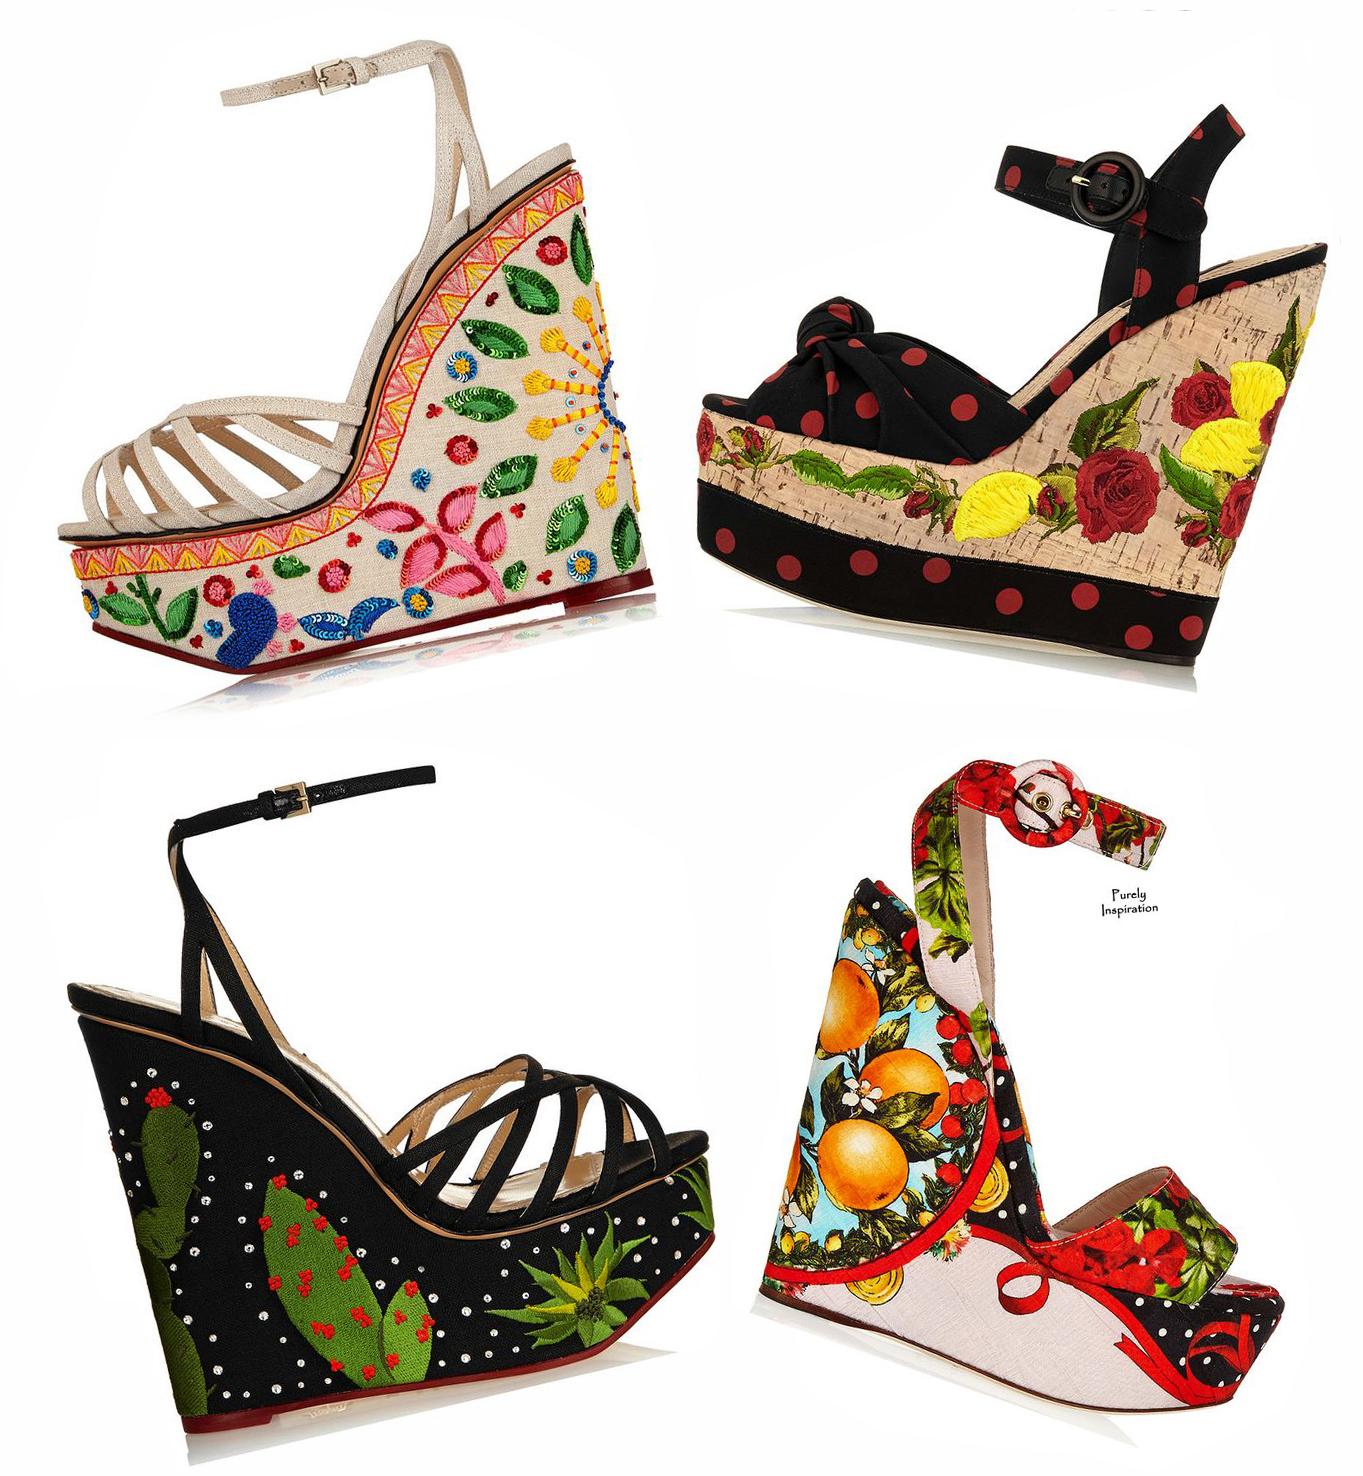 Charlotte Olympia, Dolce & Gabbana SS2015 Found on net-a-porter.com